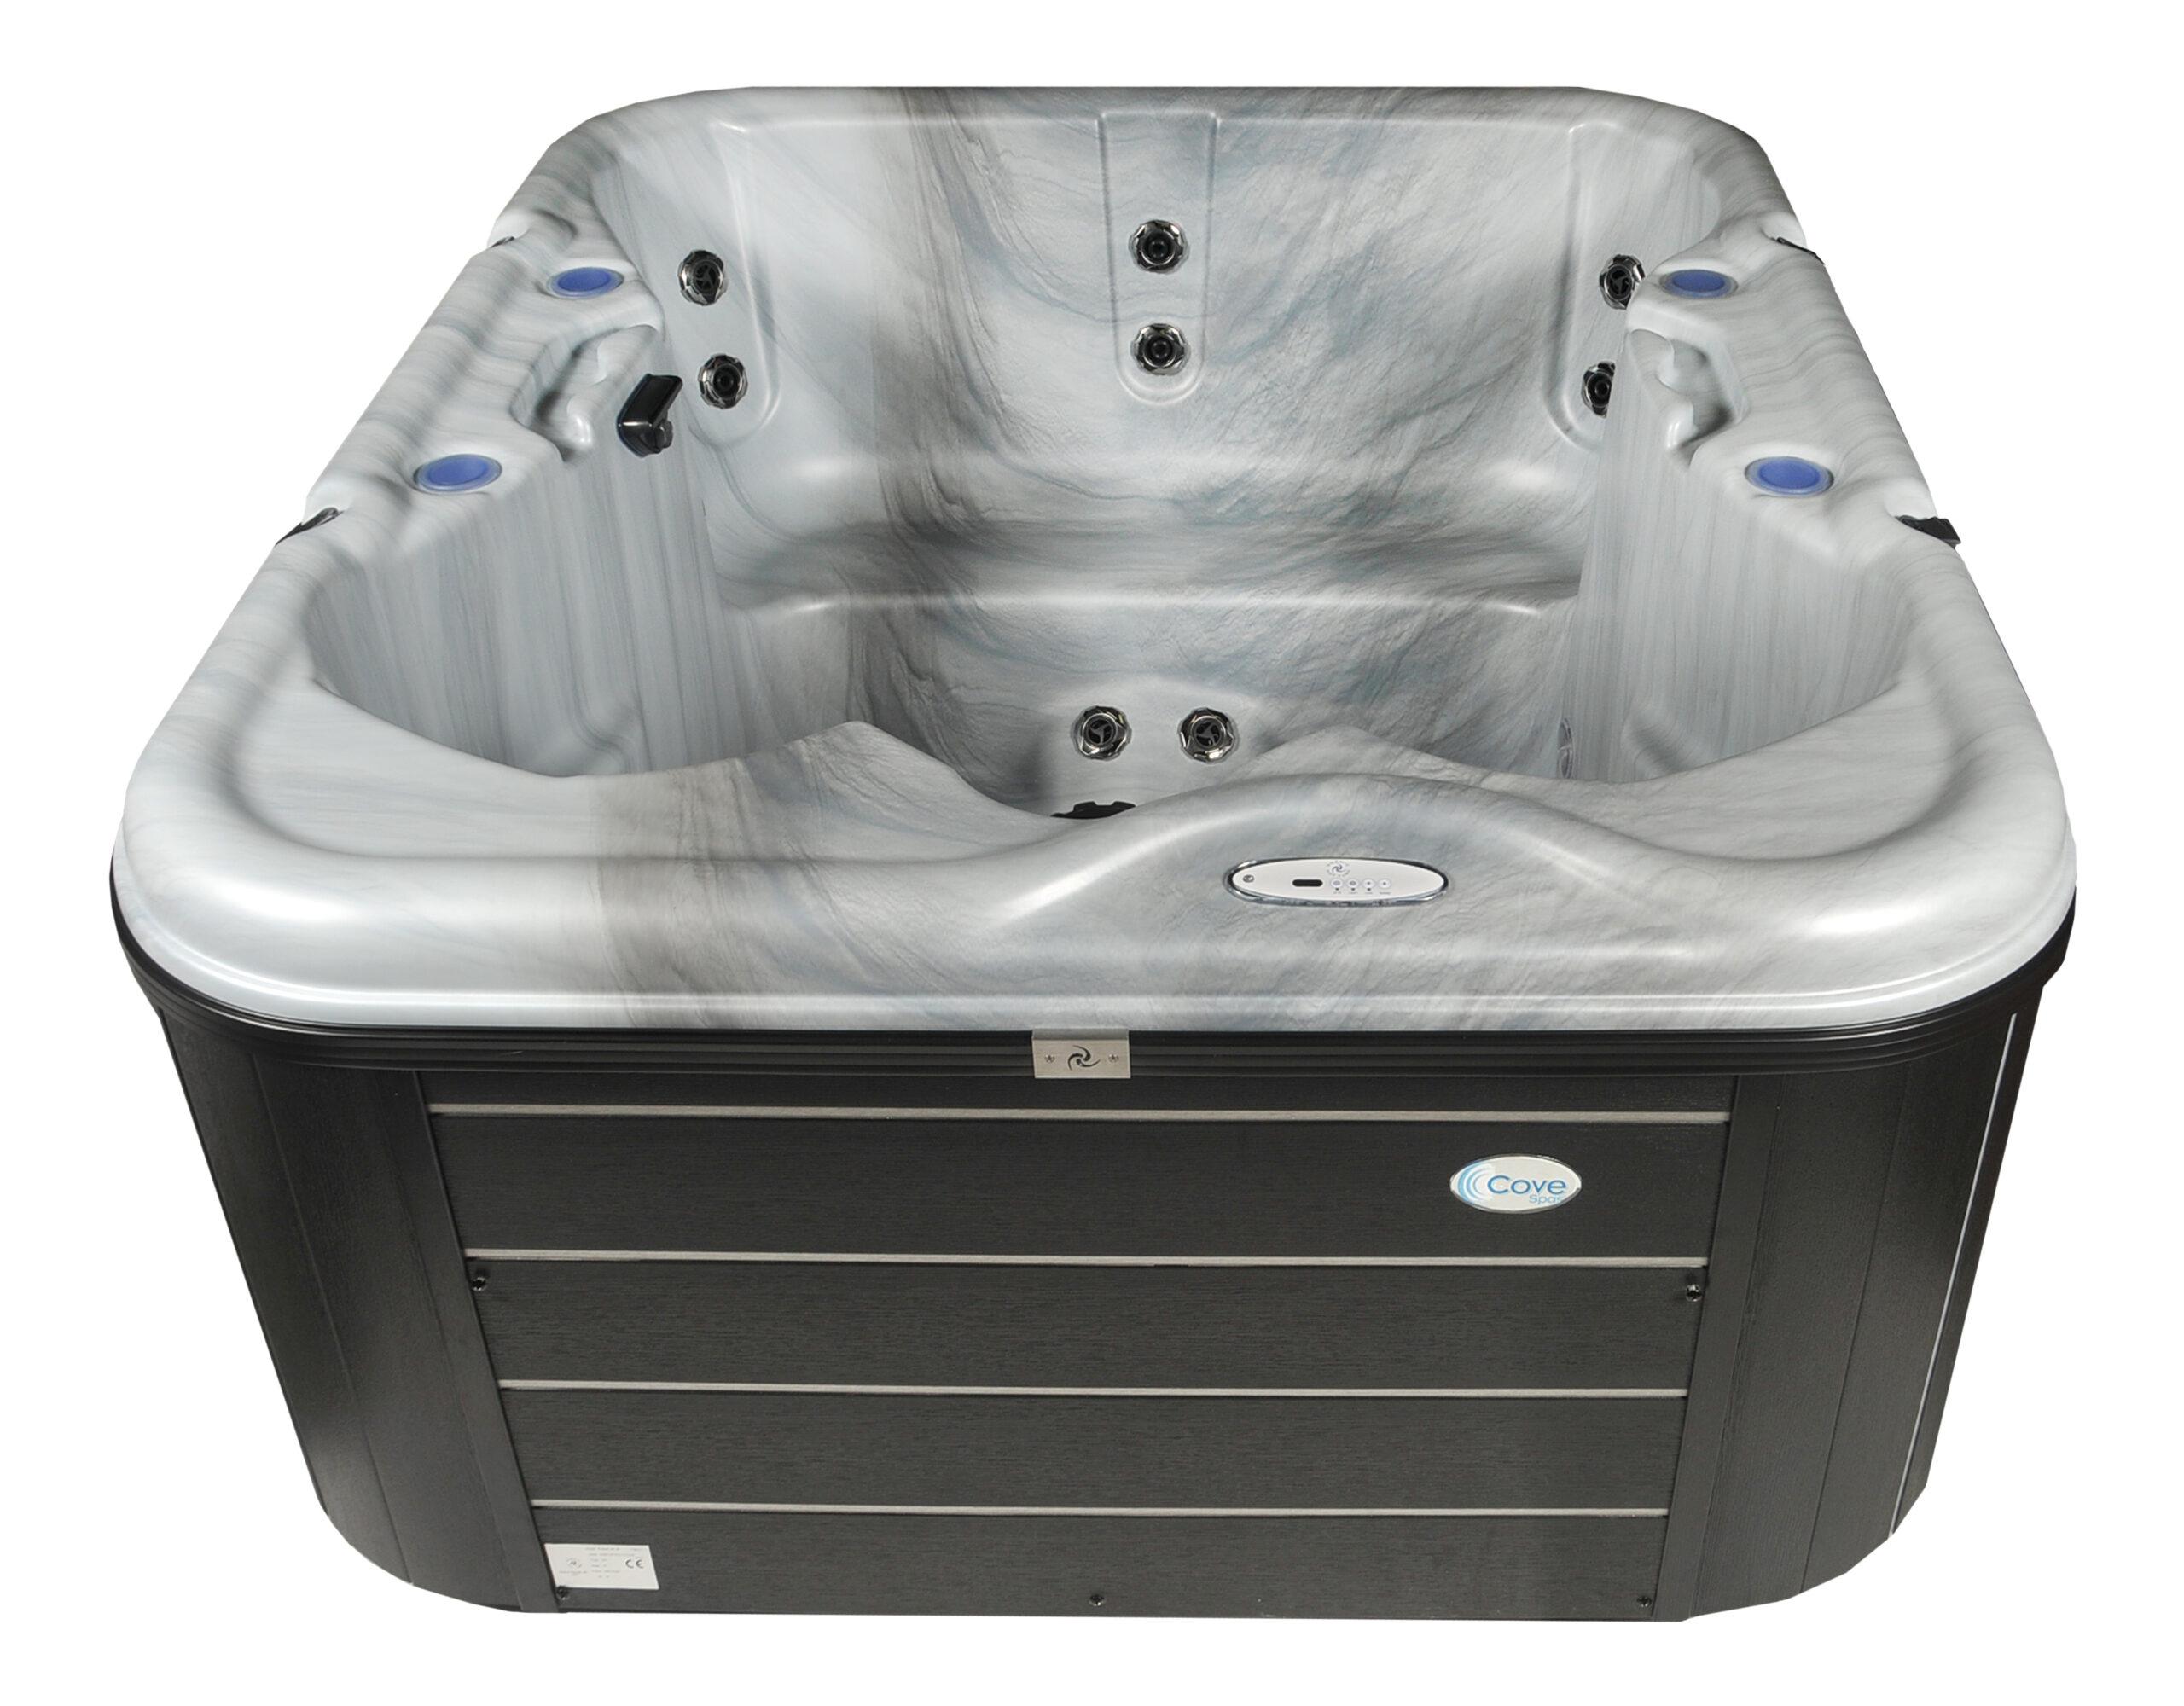 Compact hot tub